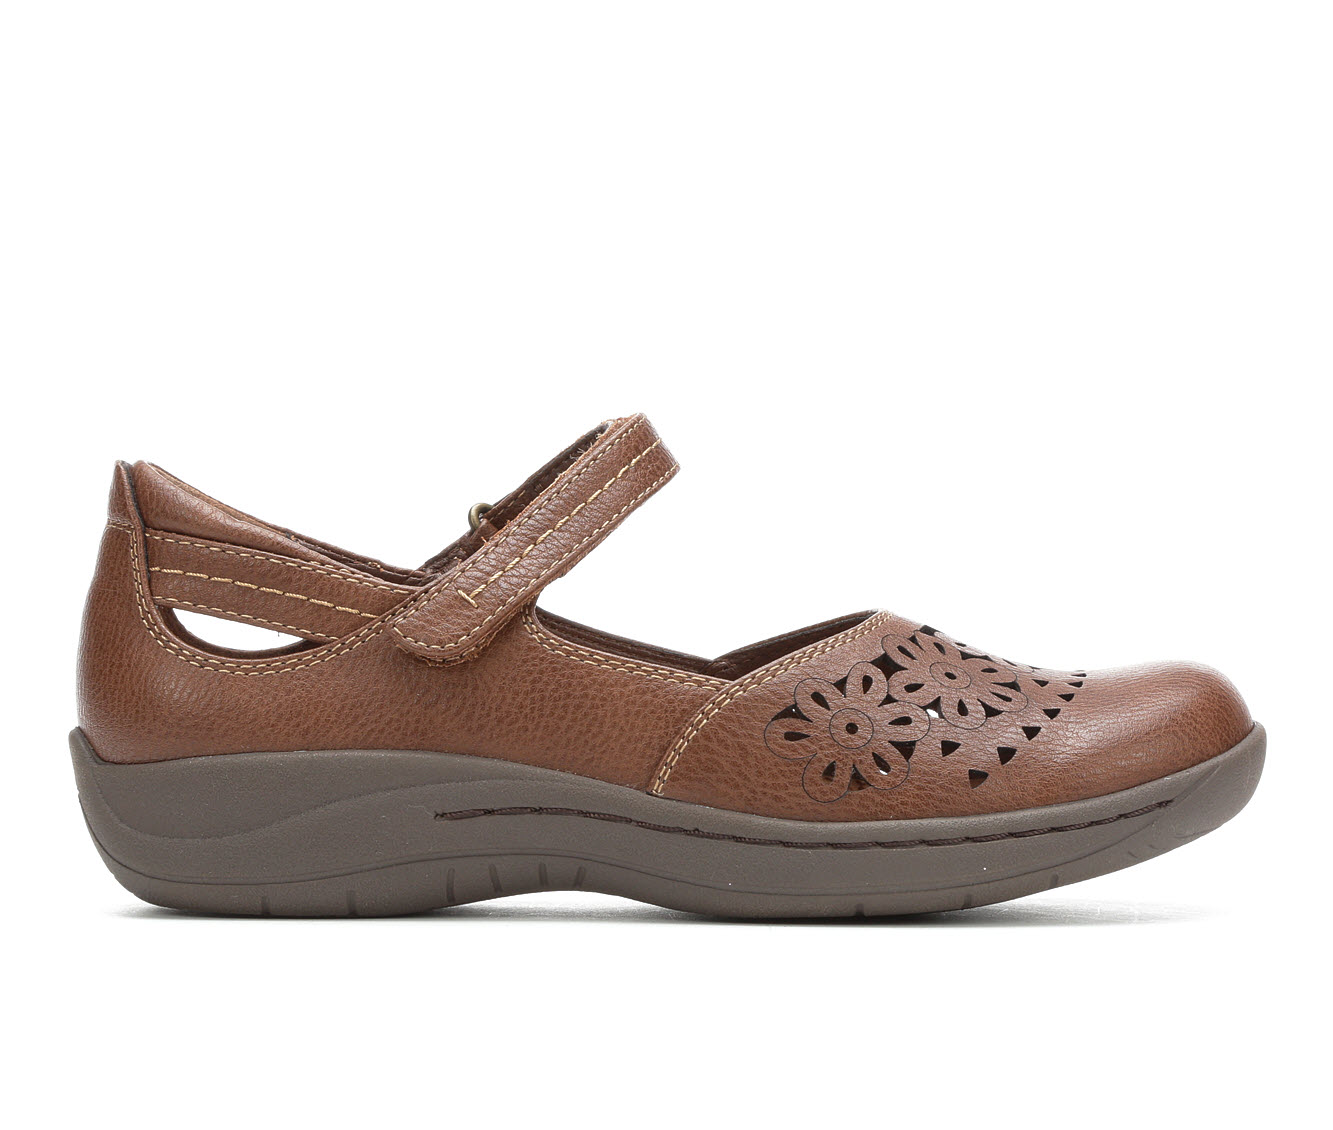 Baretraps Jennings Women's Shoe (Brown Faux Leather)